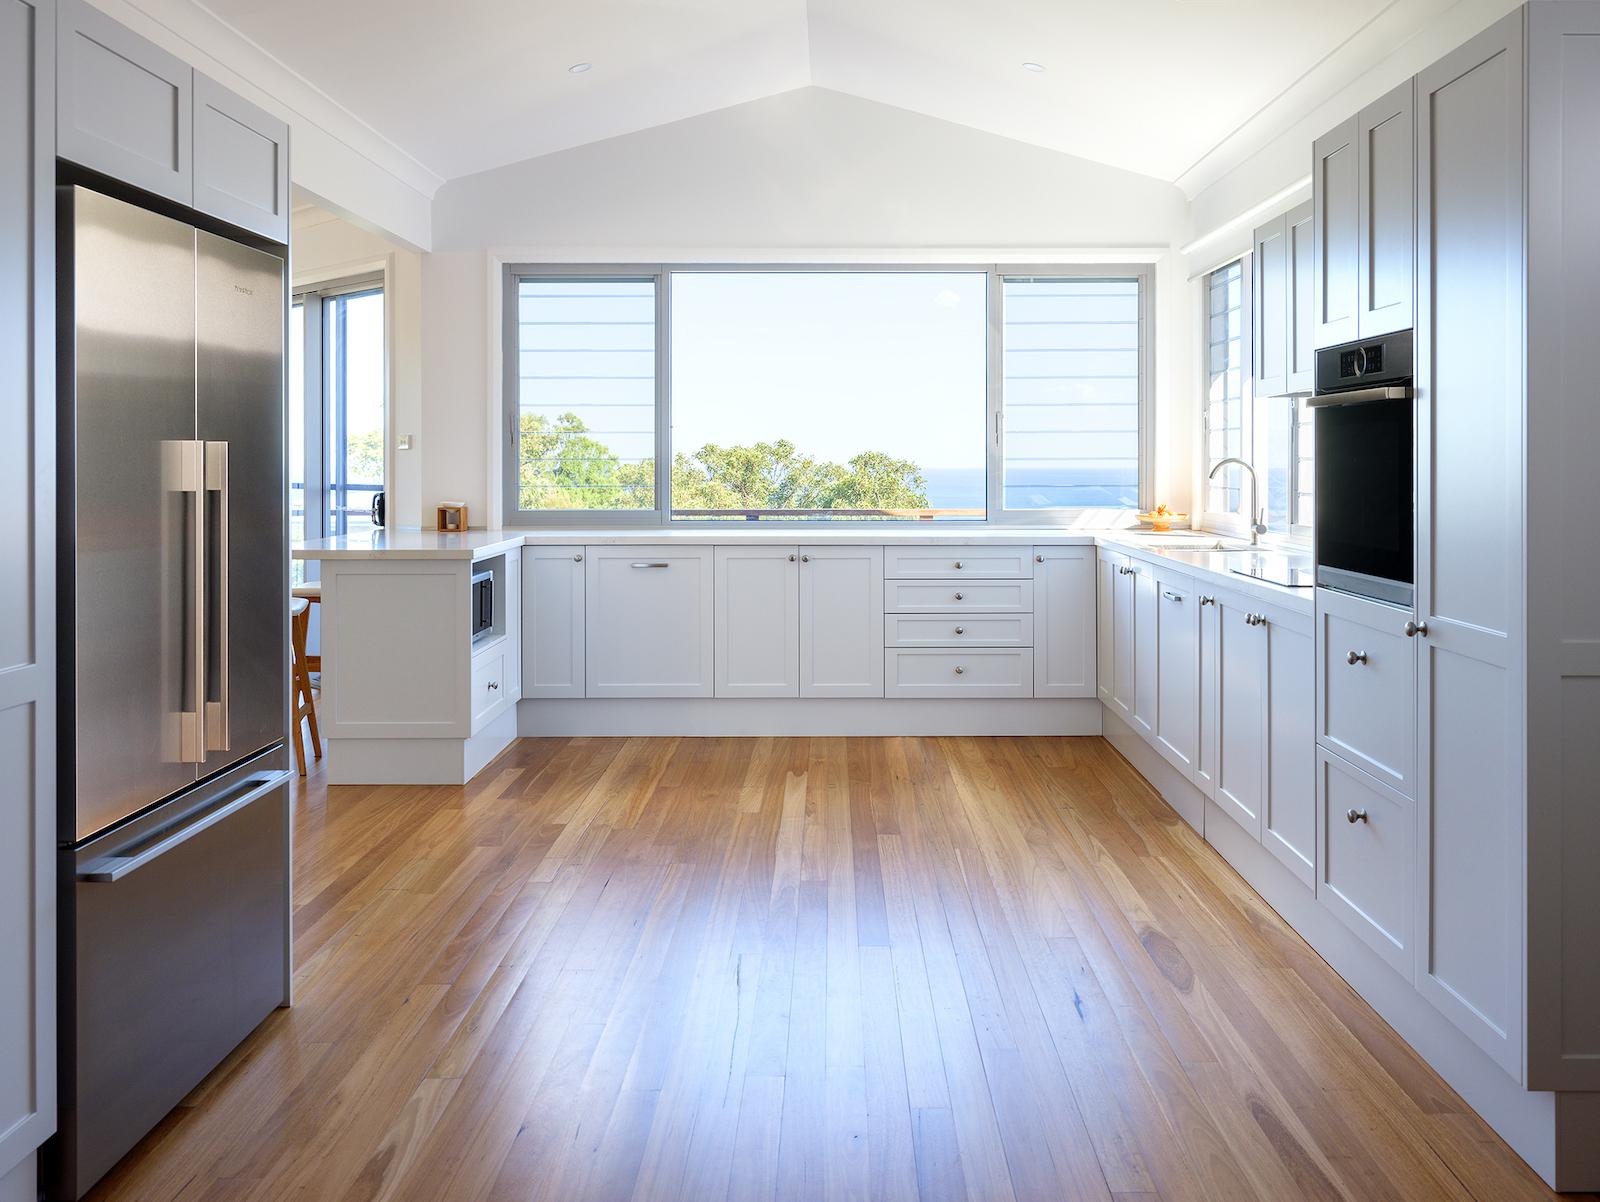 shaker kitchen carrara marble Killcare Architect.jpg